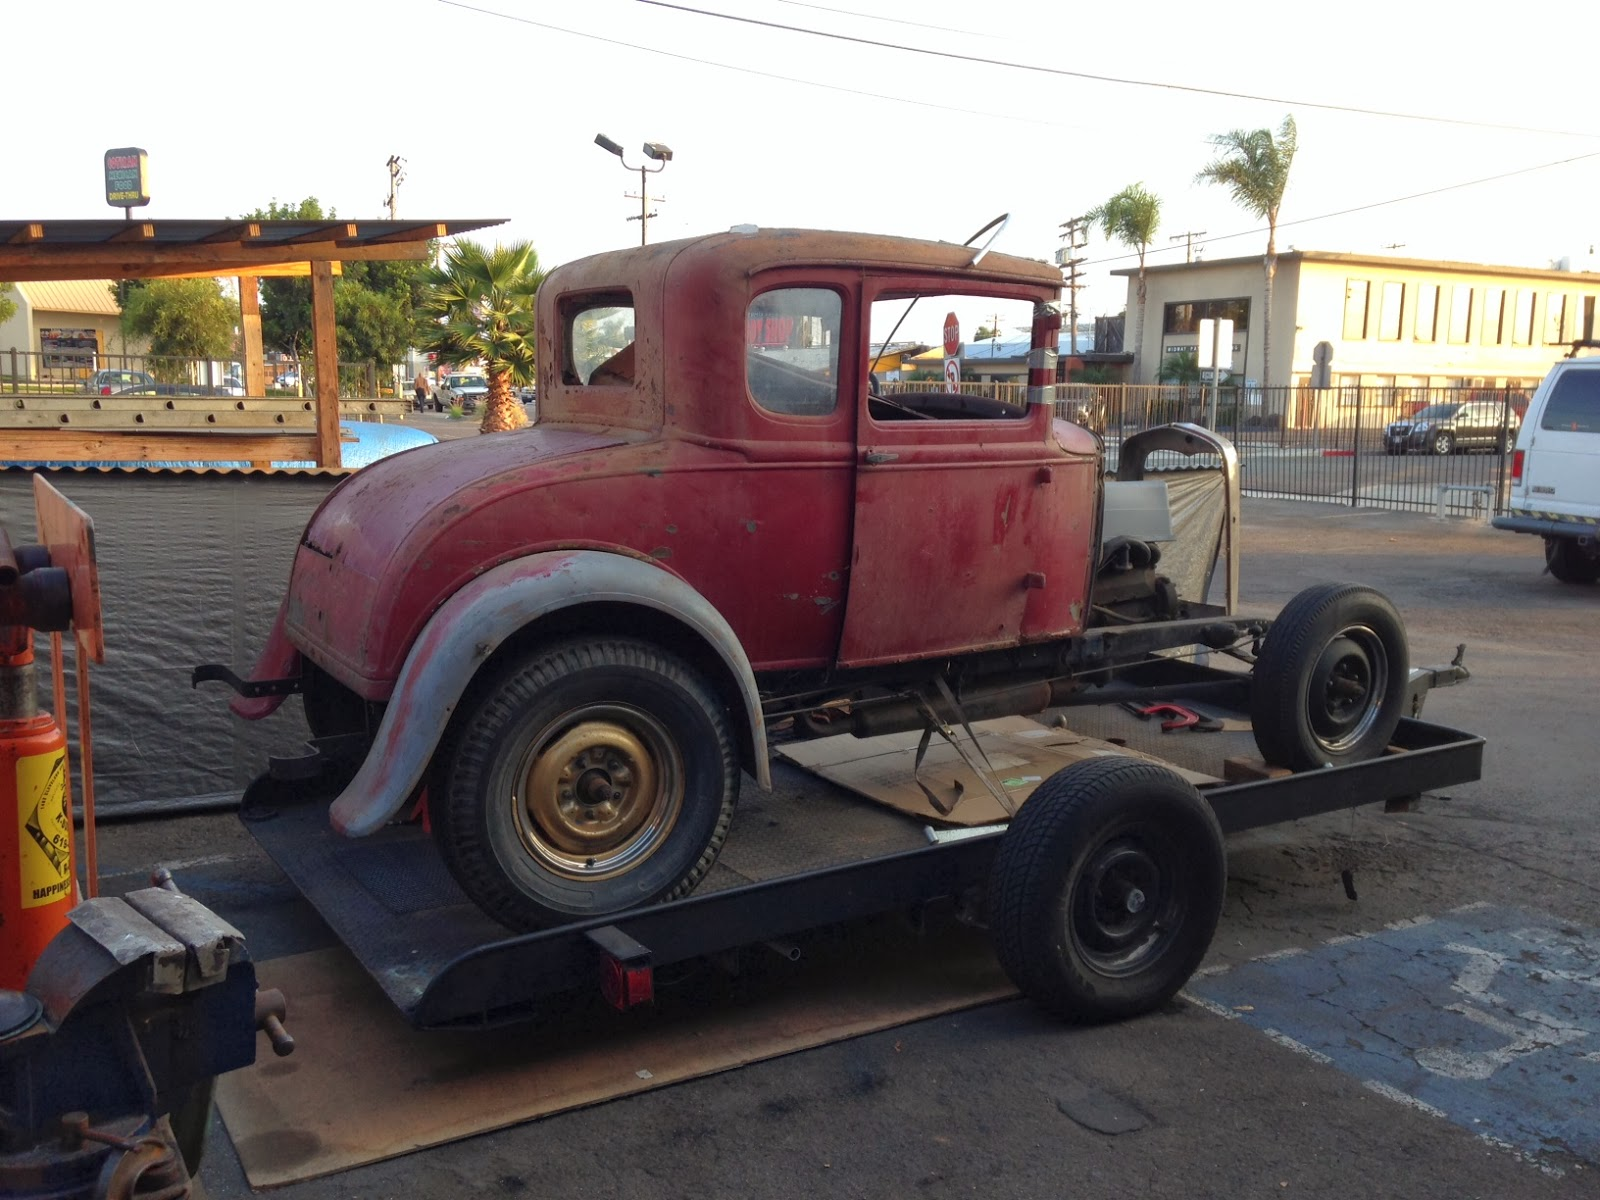 1931 Ford Coupe Craigslist | Autos Post